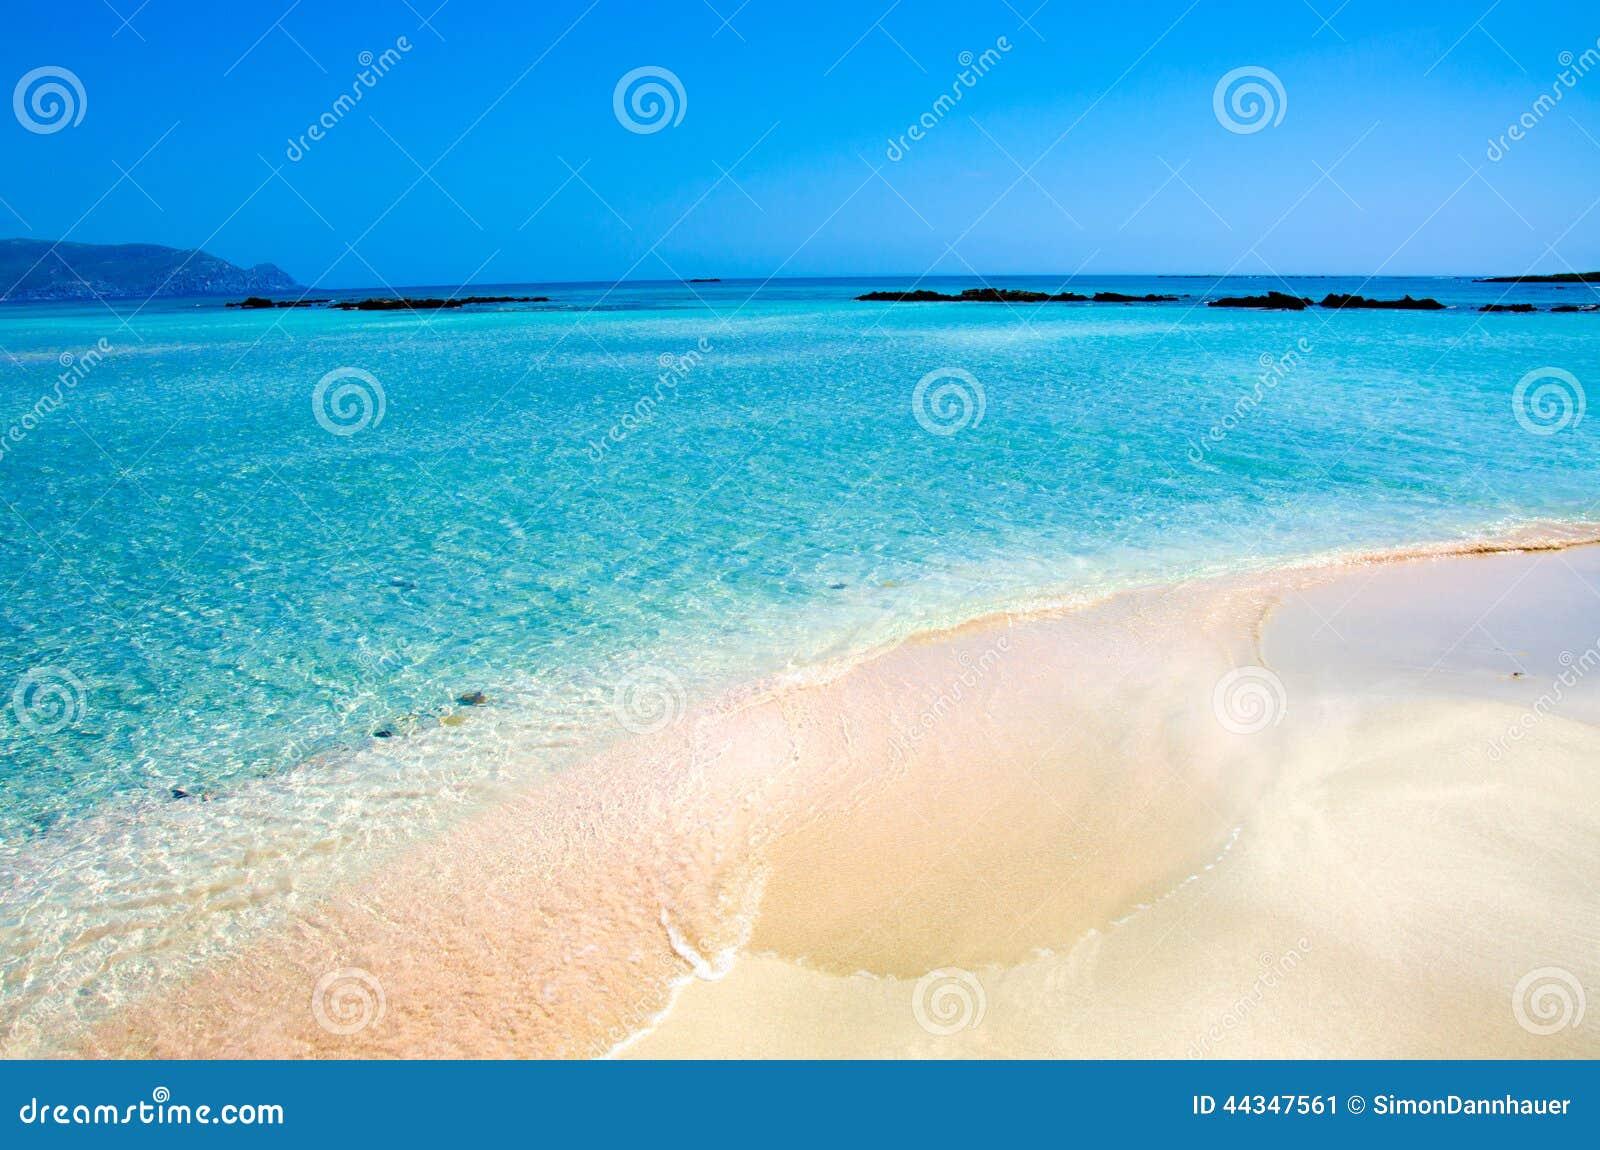 Elafonisi Beach Crete Island Greece